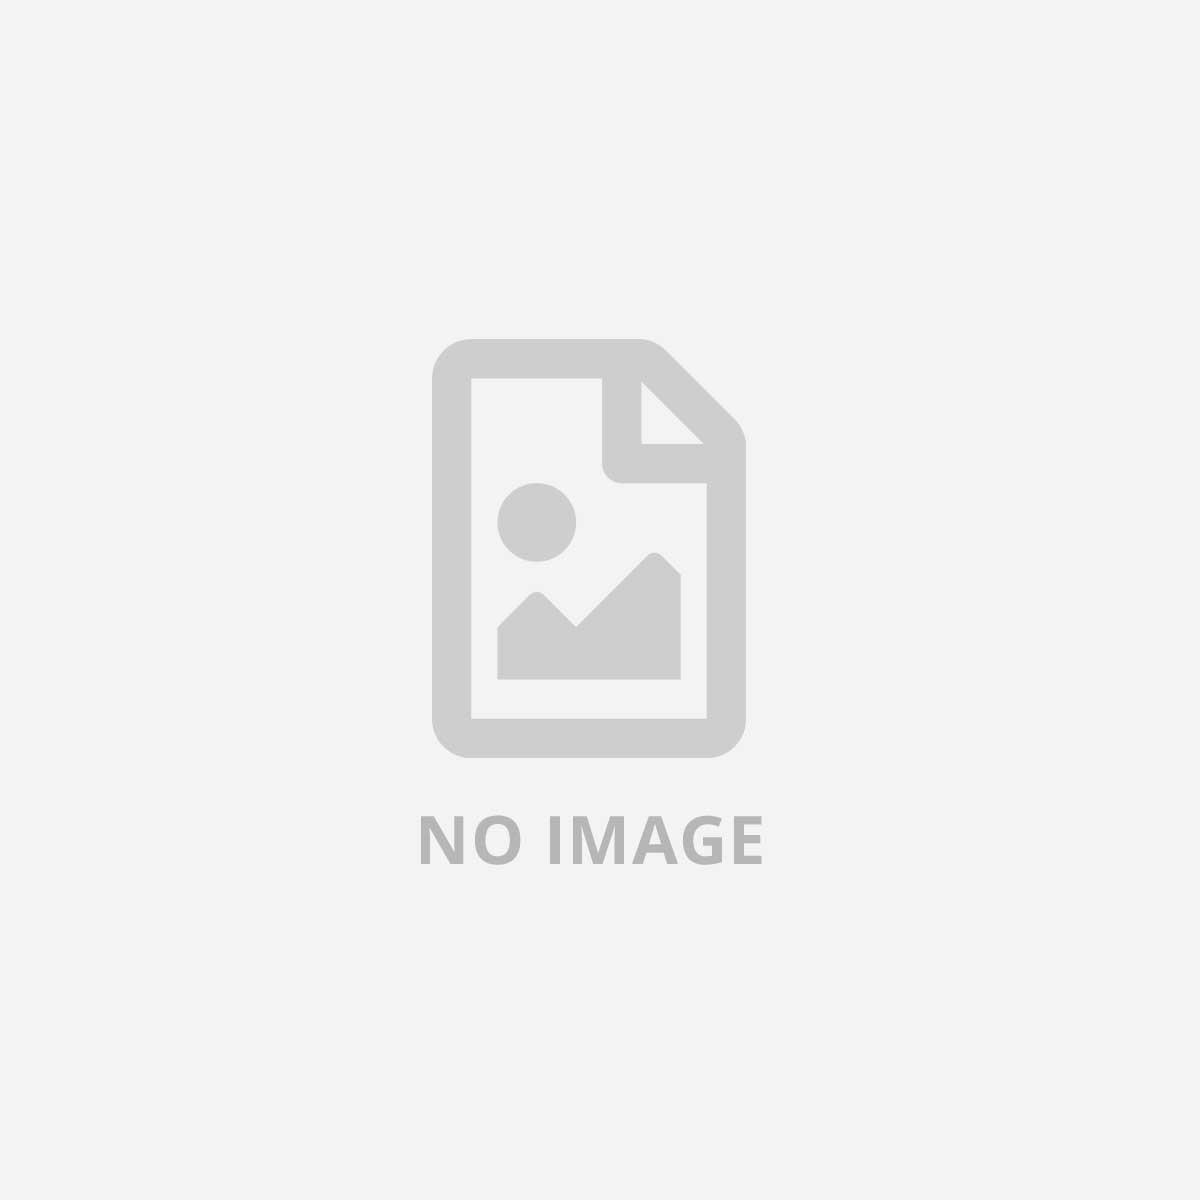 FUJIFILM LTO 6 ULTRIUM 2 5TB-6 25TB